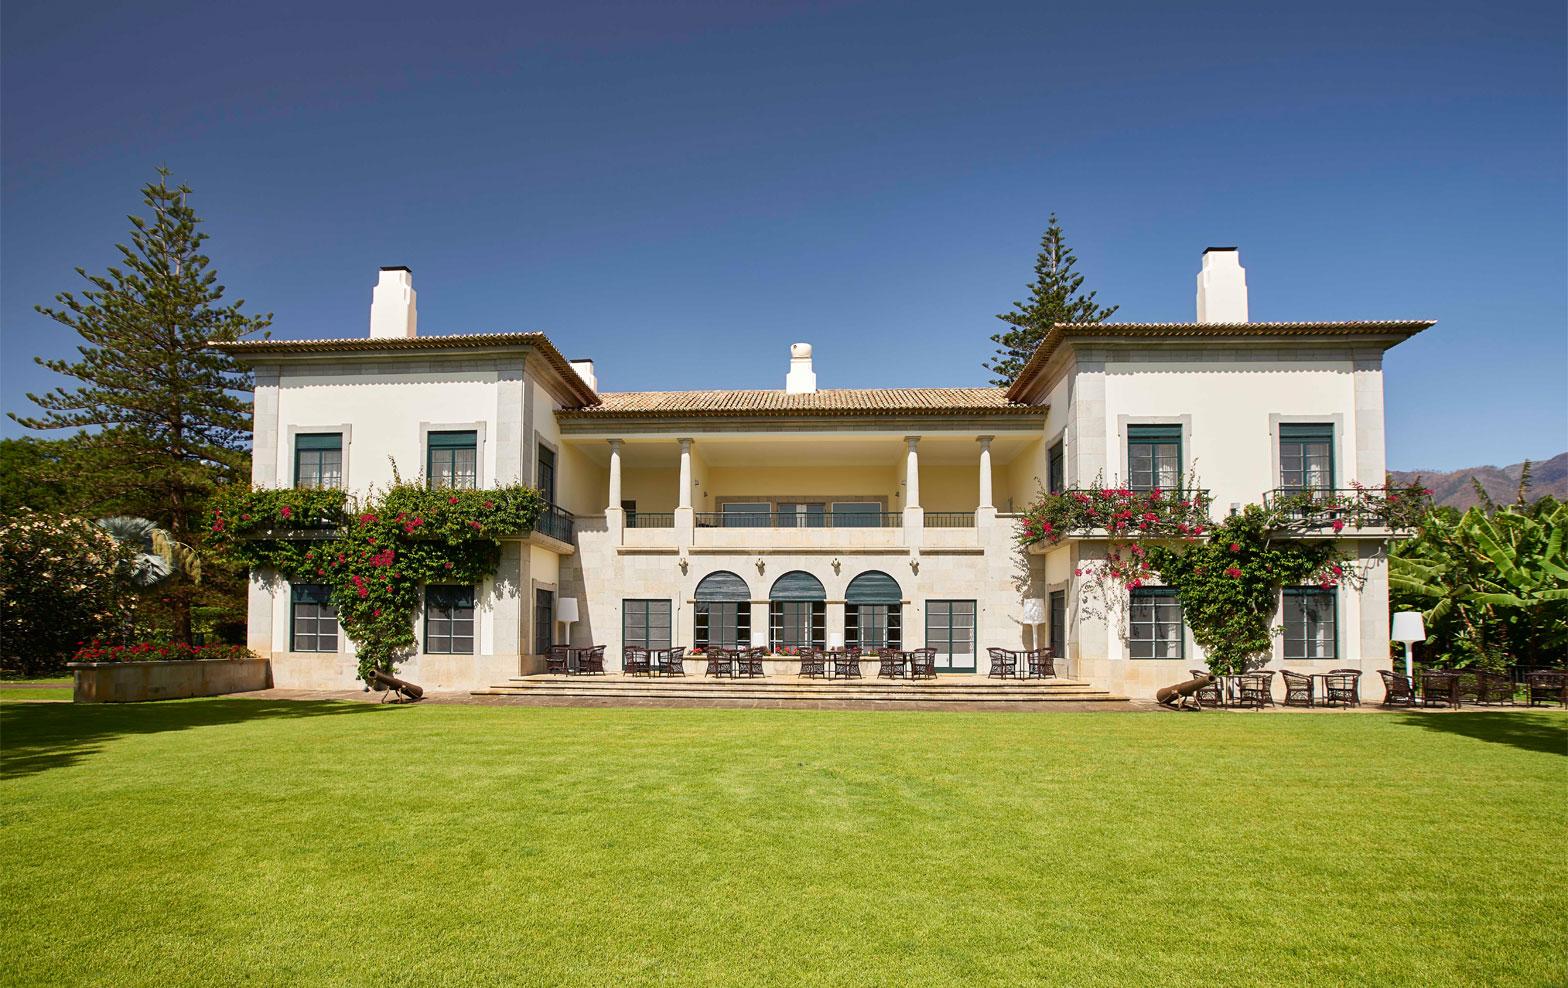 Quinta da Casa Branca Ansicht